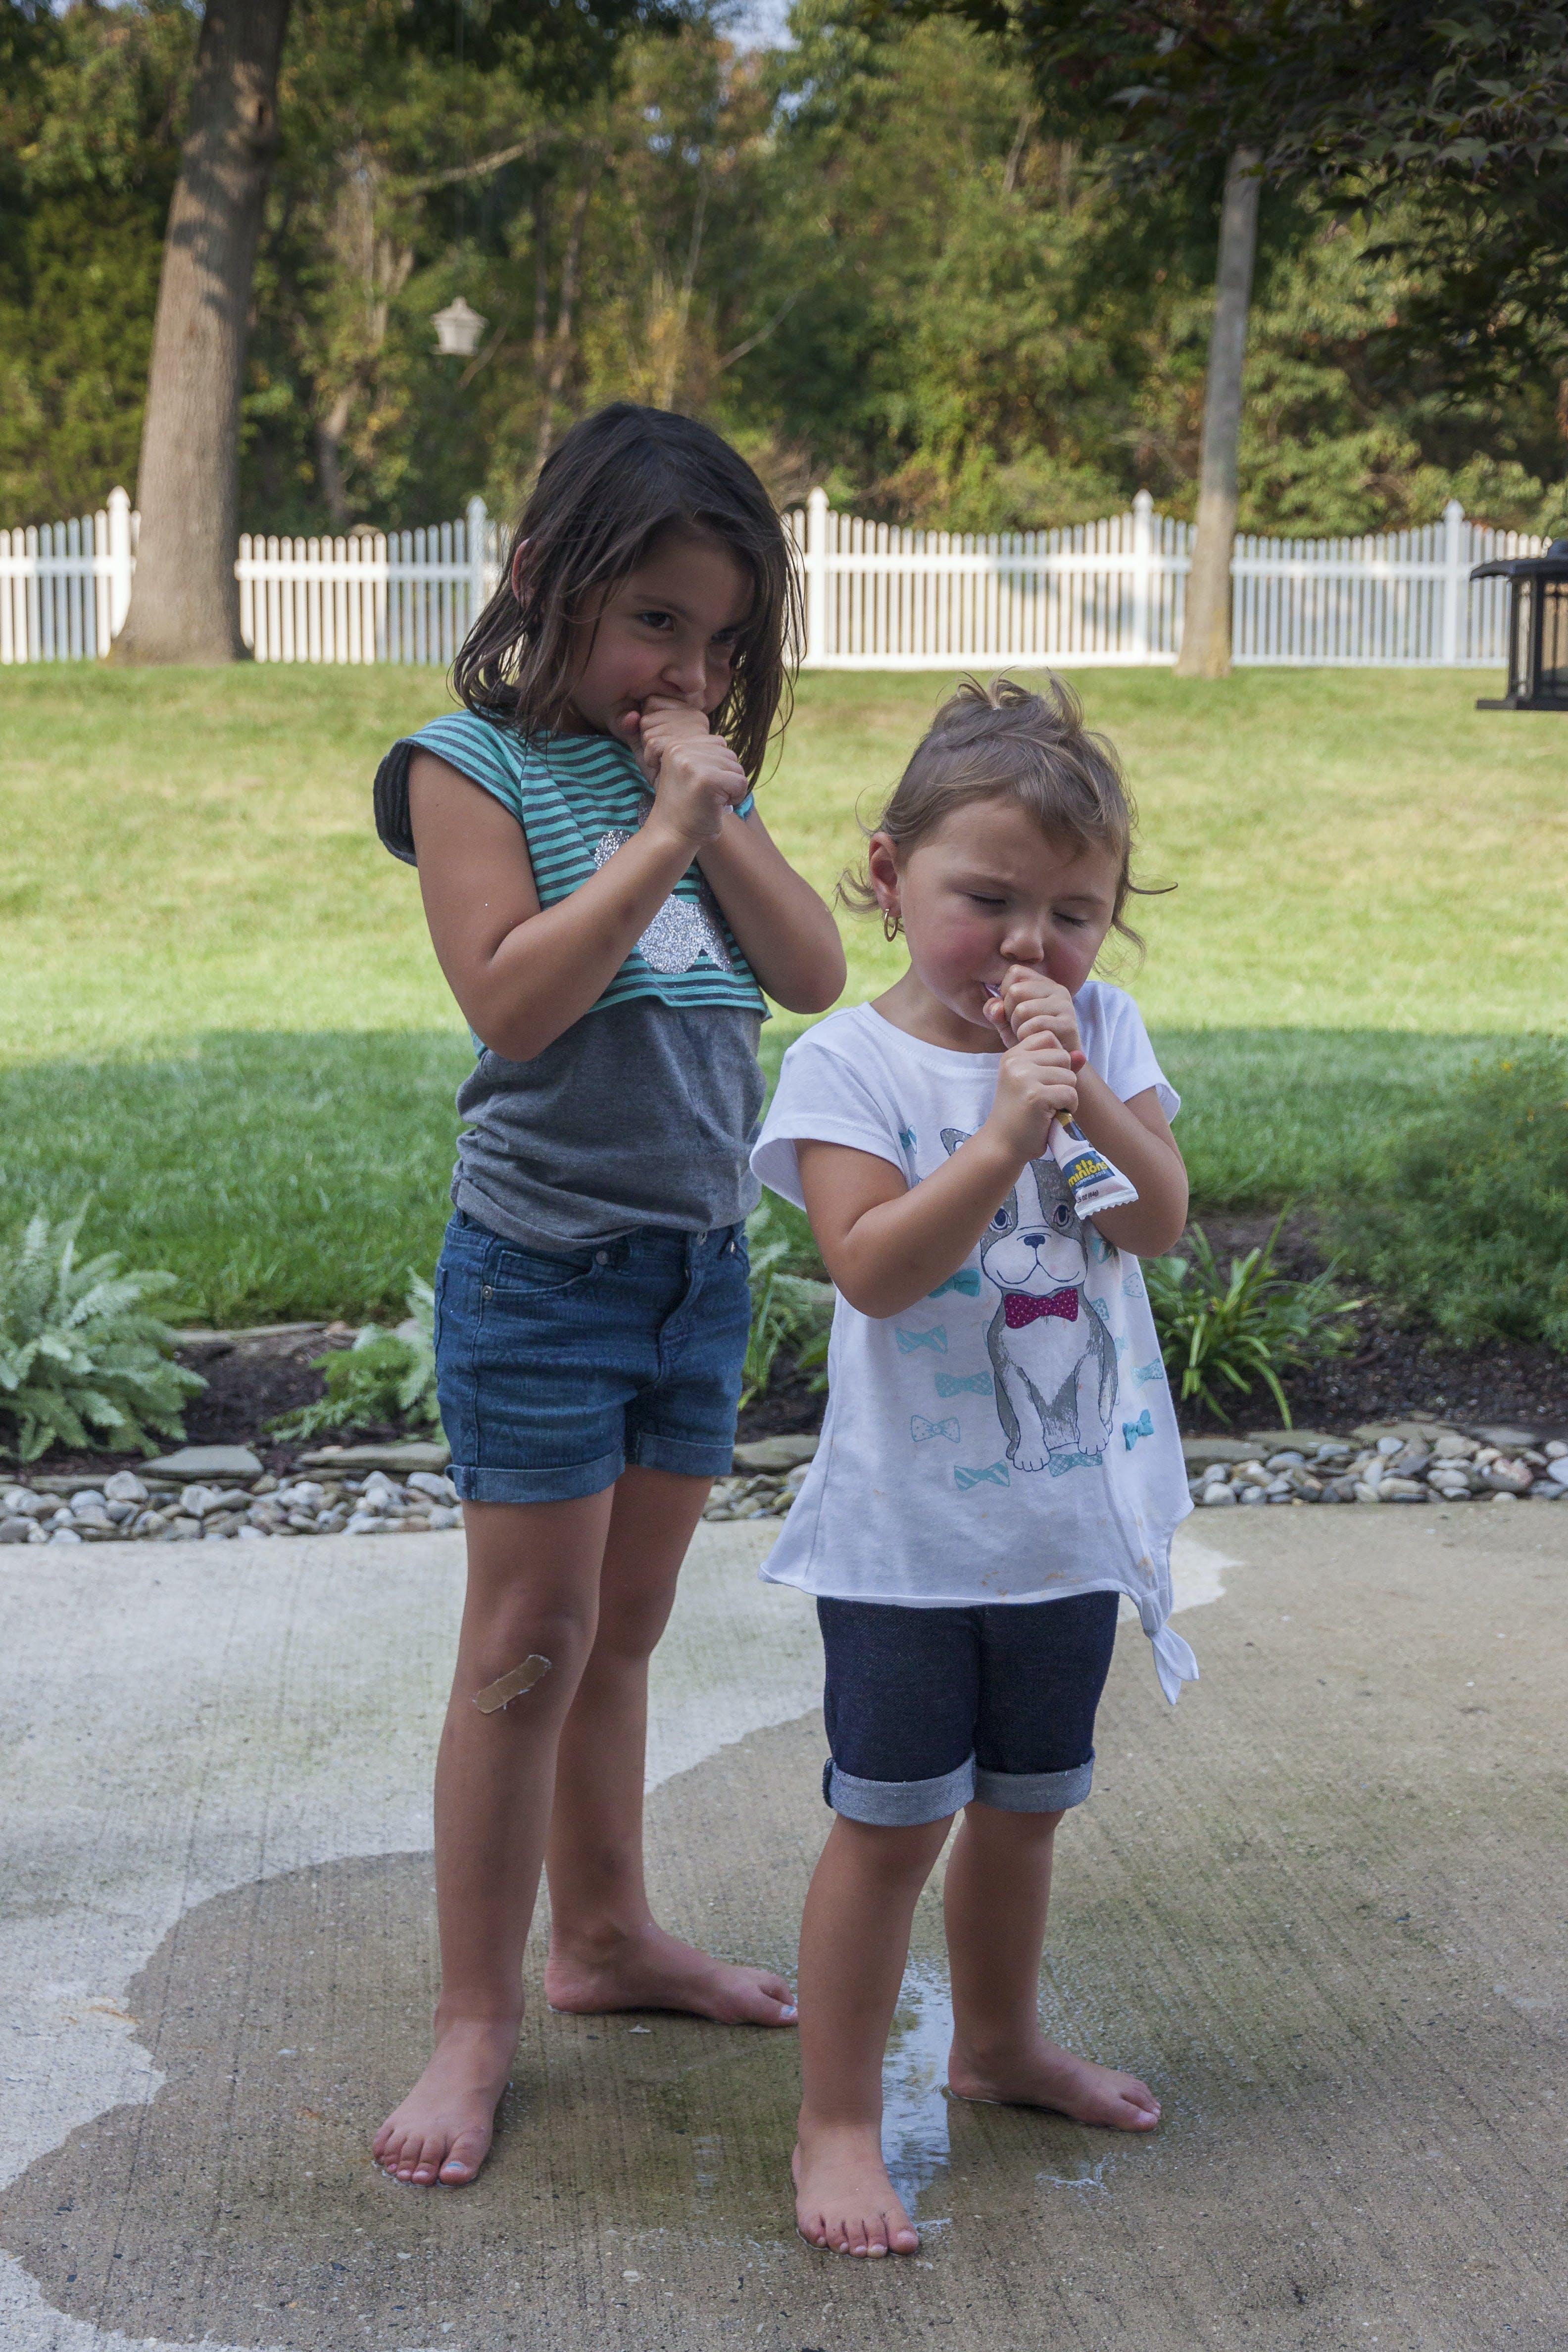 Free stock photo of little girls